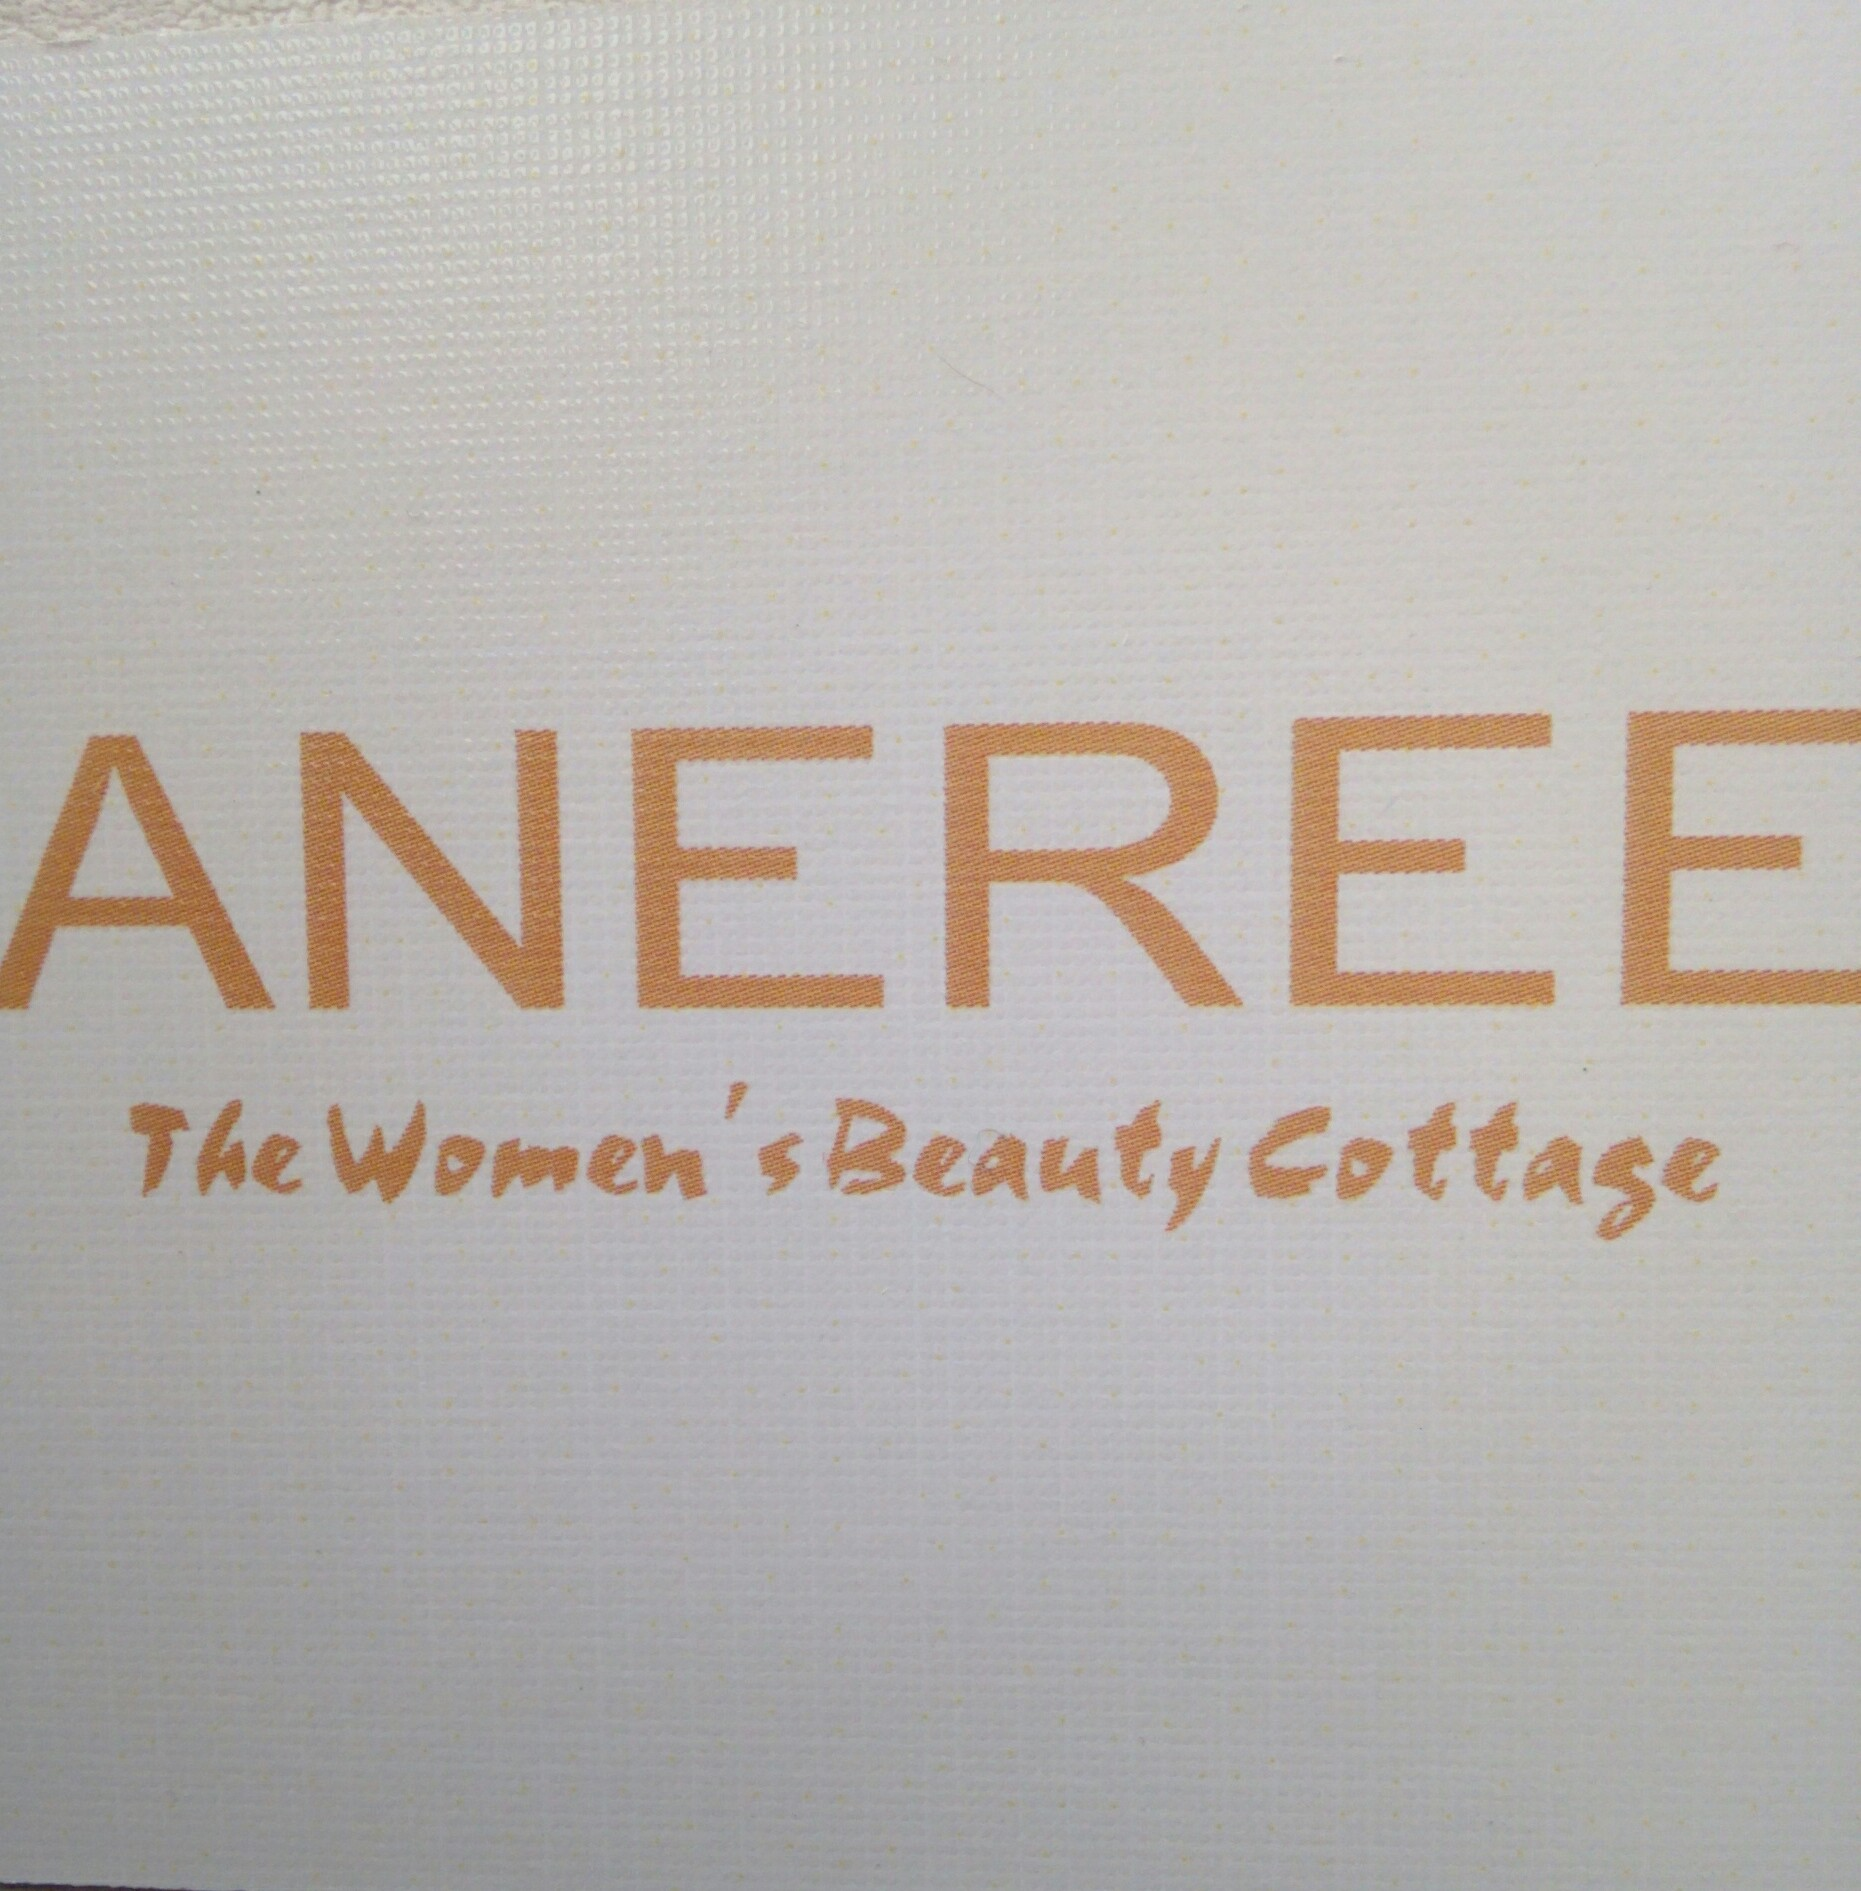 Aneree The Women Beauty Cottage - Bopal - Ahmedabad Image